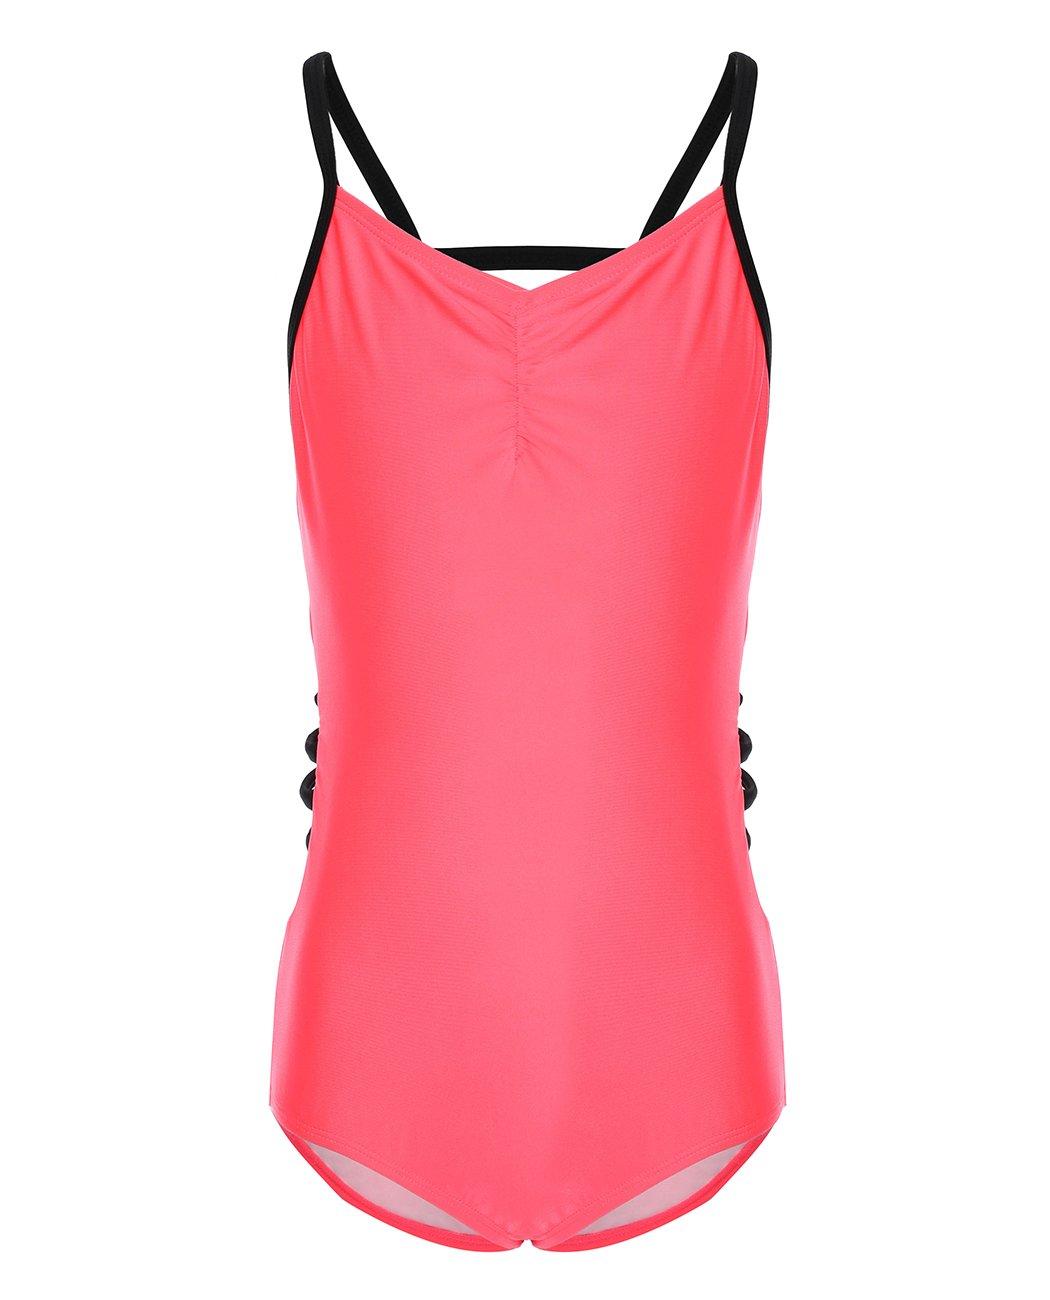 iDrawl Kids Beach Swimwear One Piece Girls Swimsuit Red Waist Cutout Bathing Suit